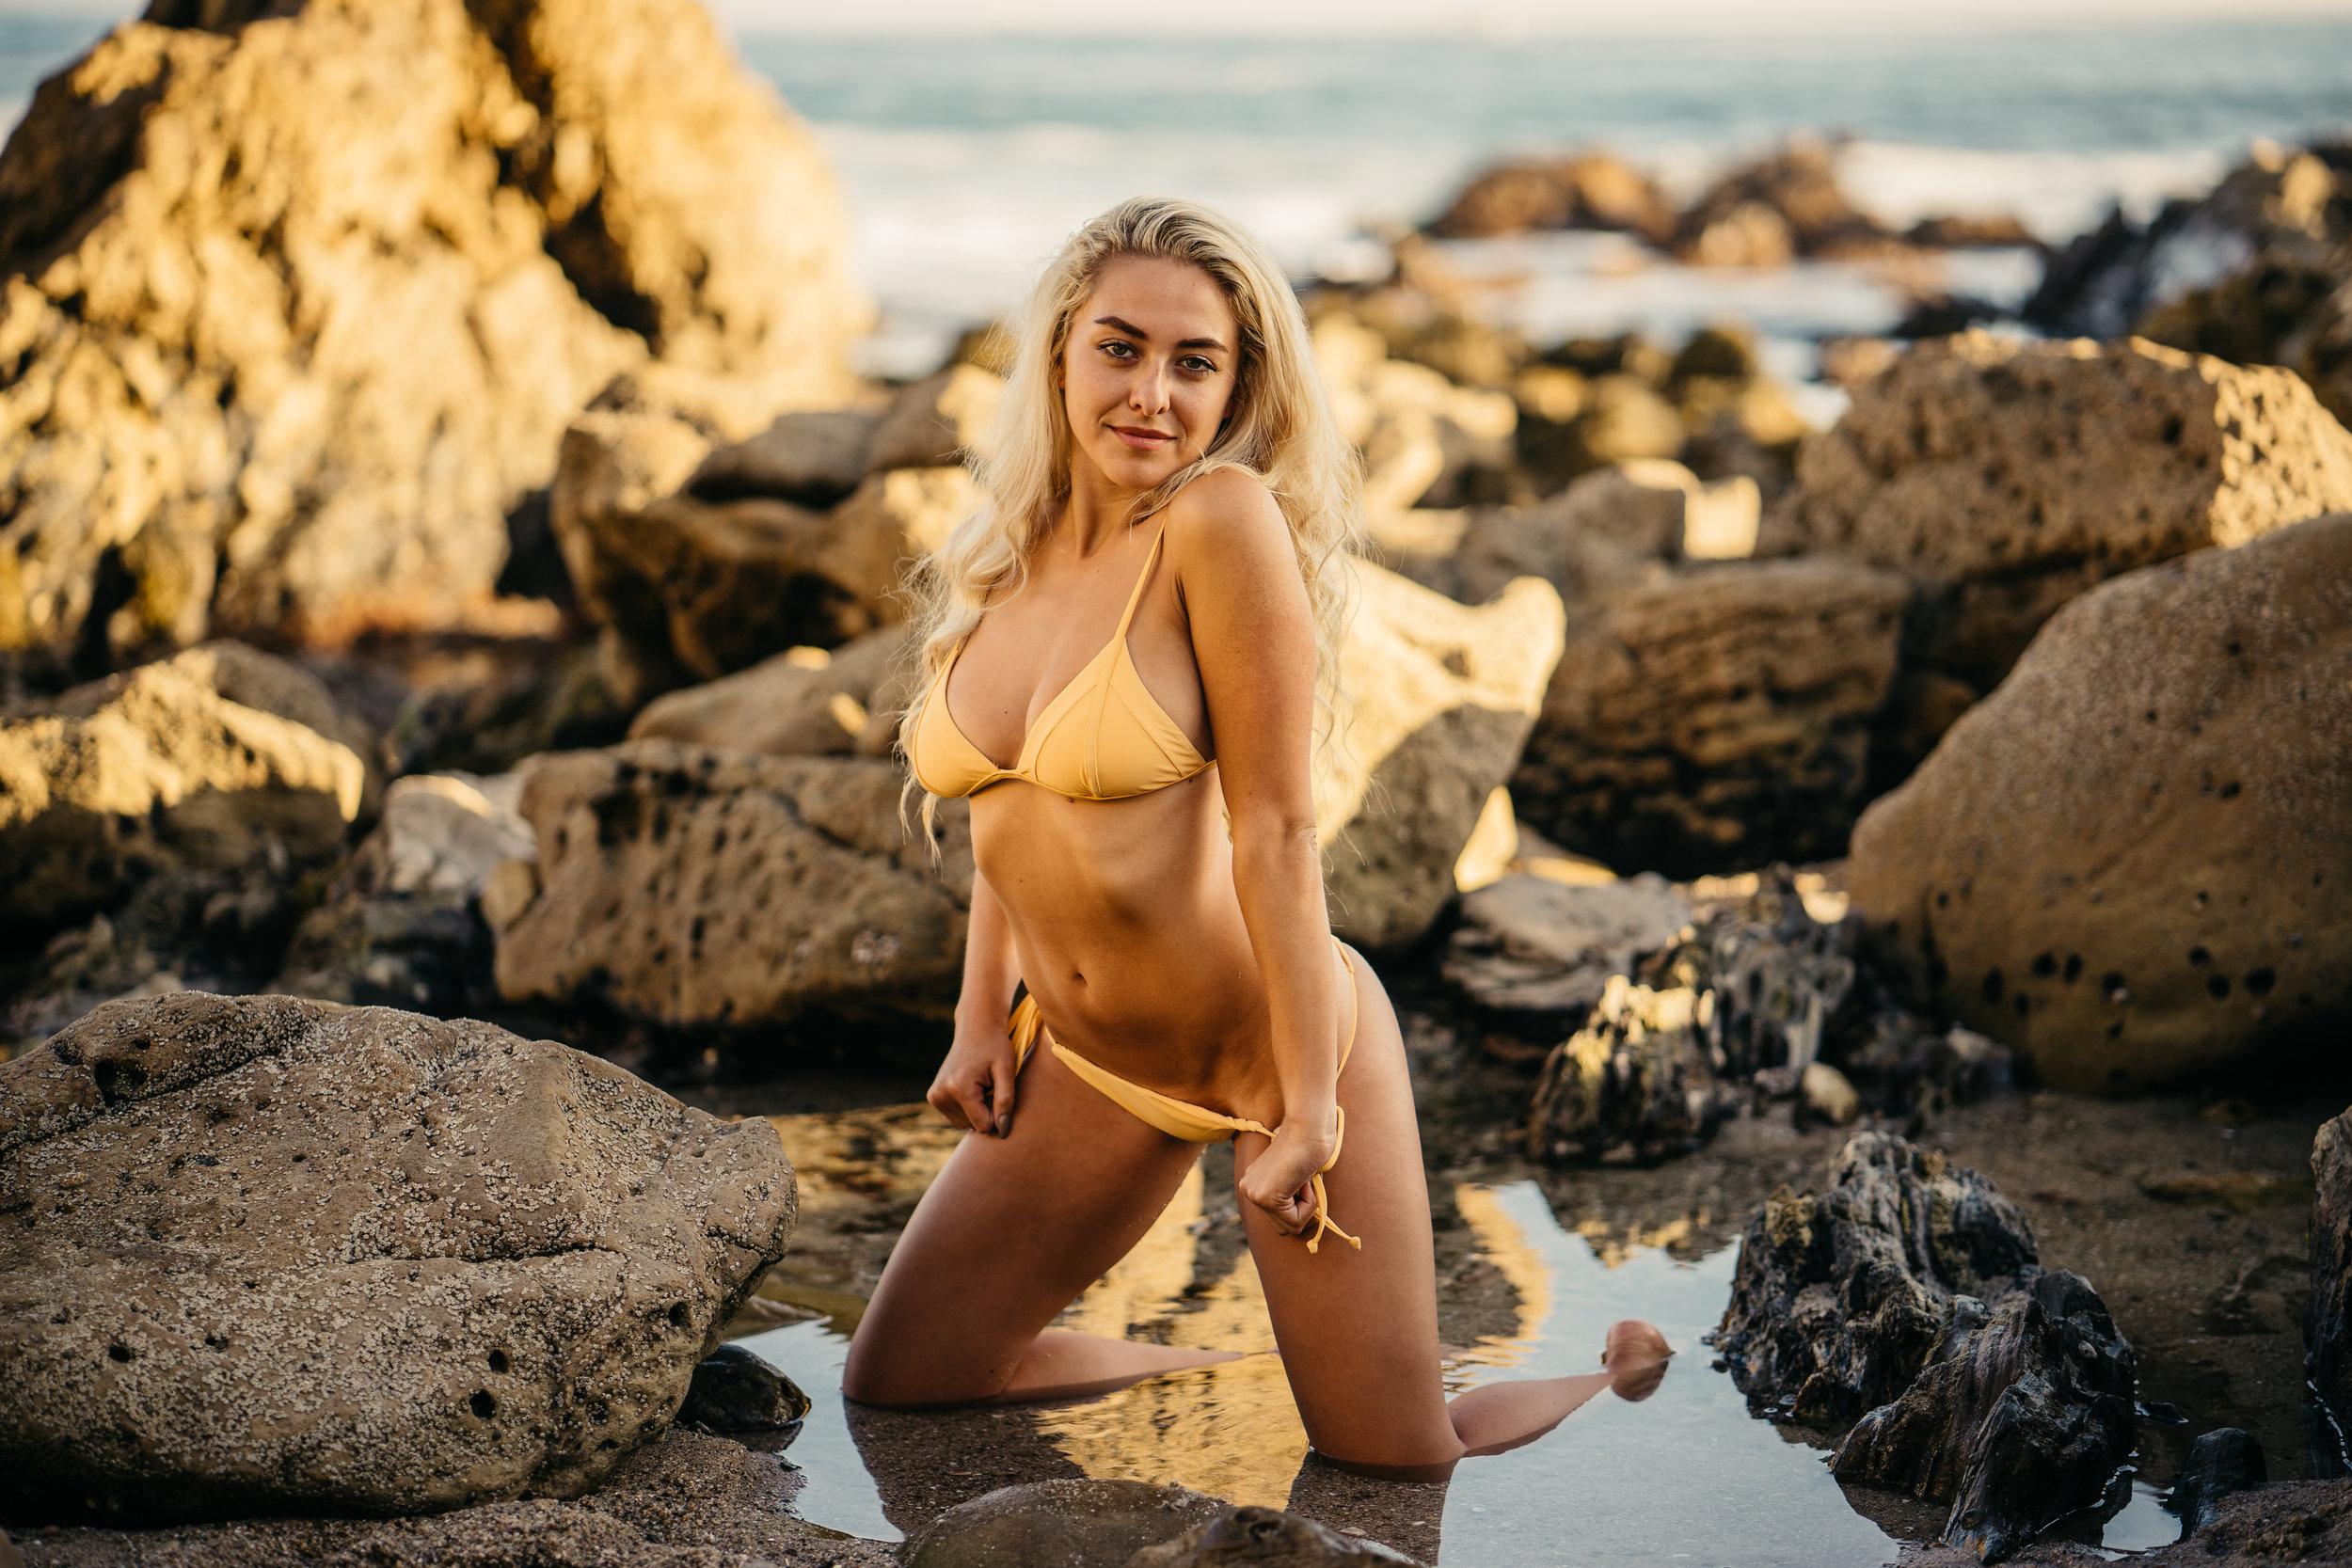 @b_sanmiguel  Little Corona Beach - Corona Del Mar, CALIFORNIA